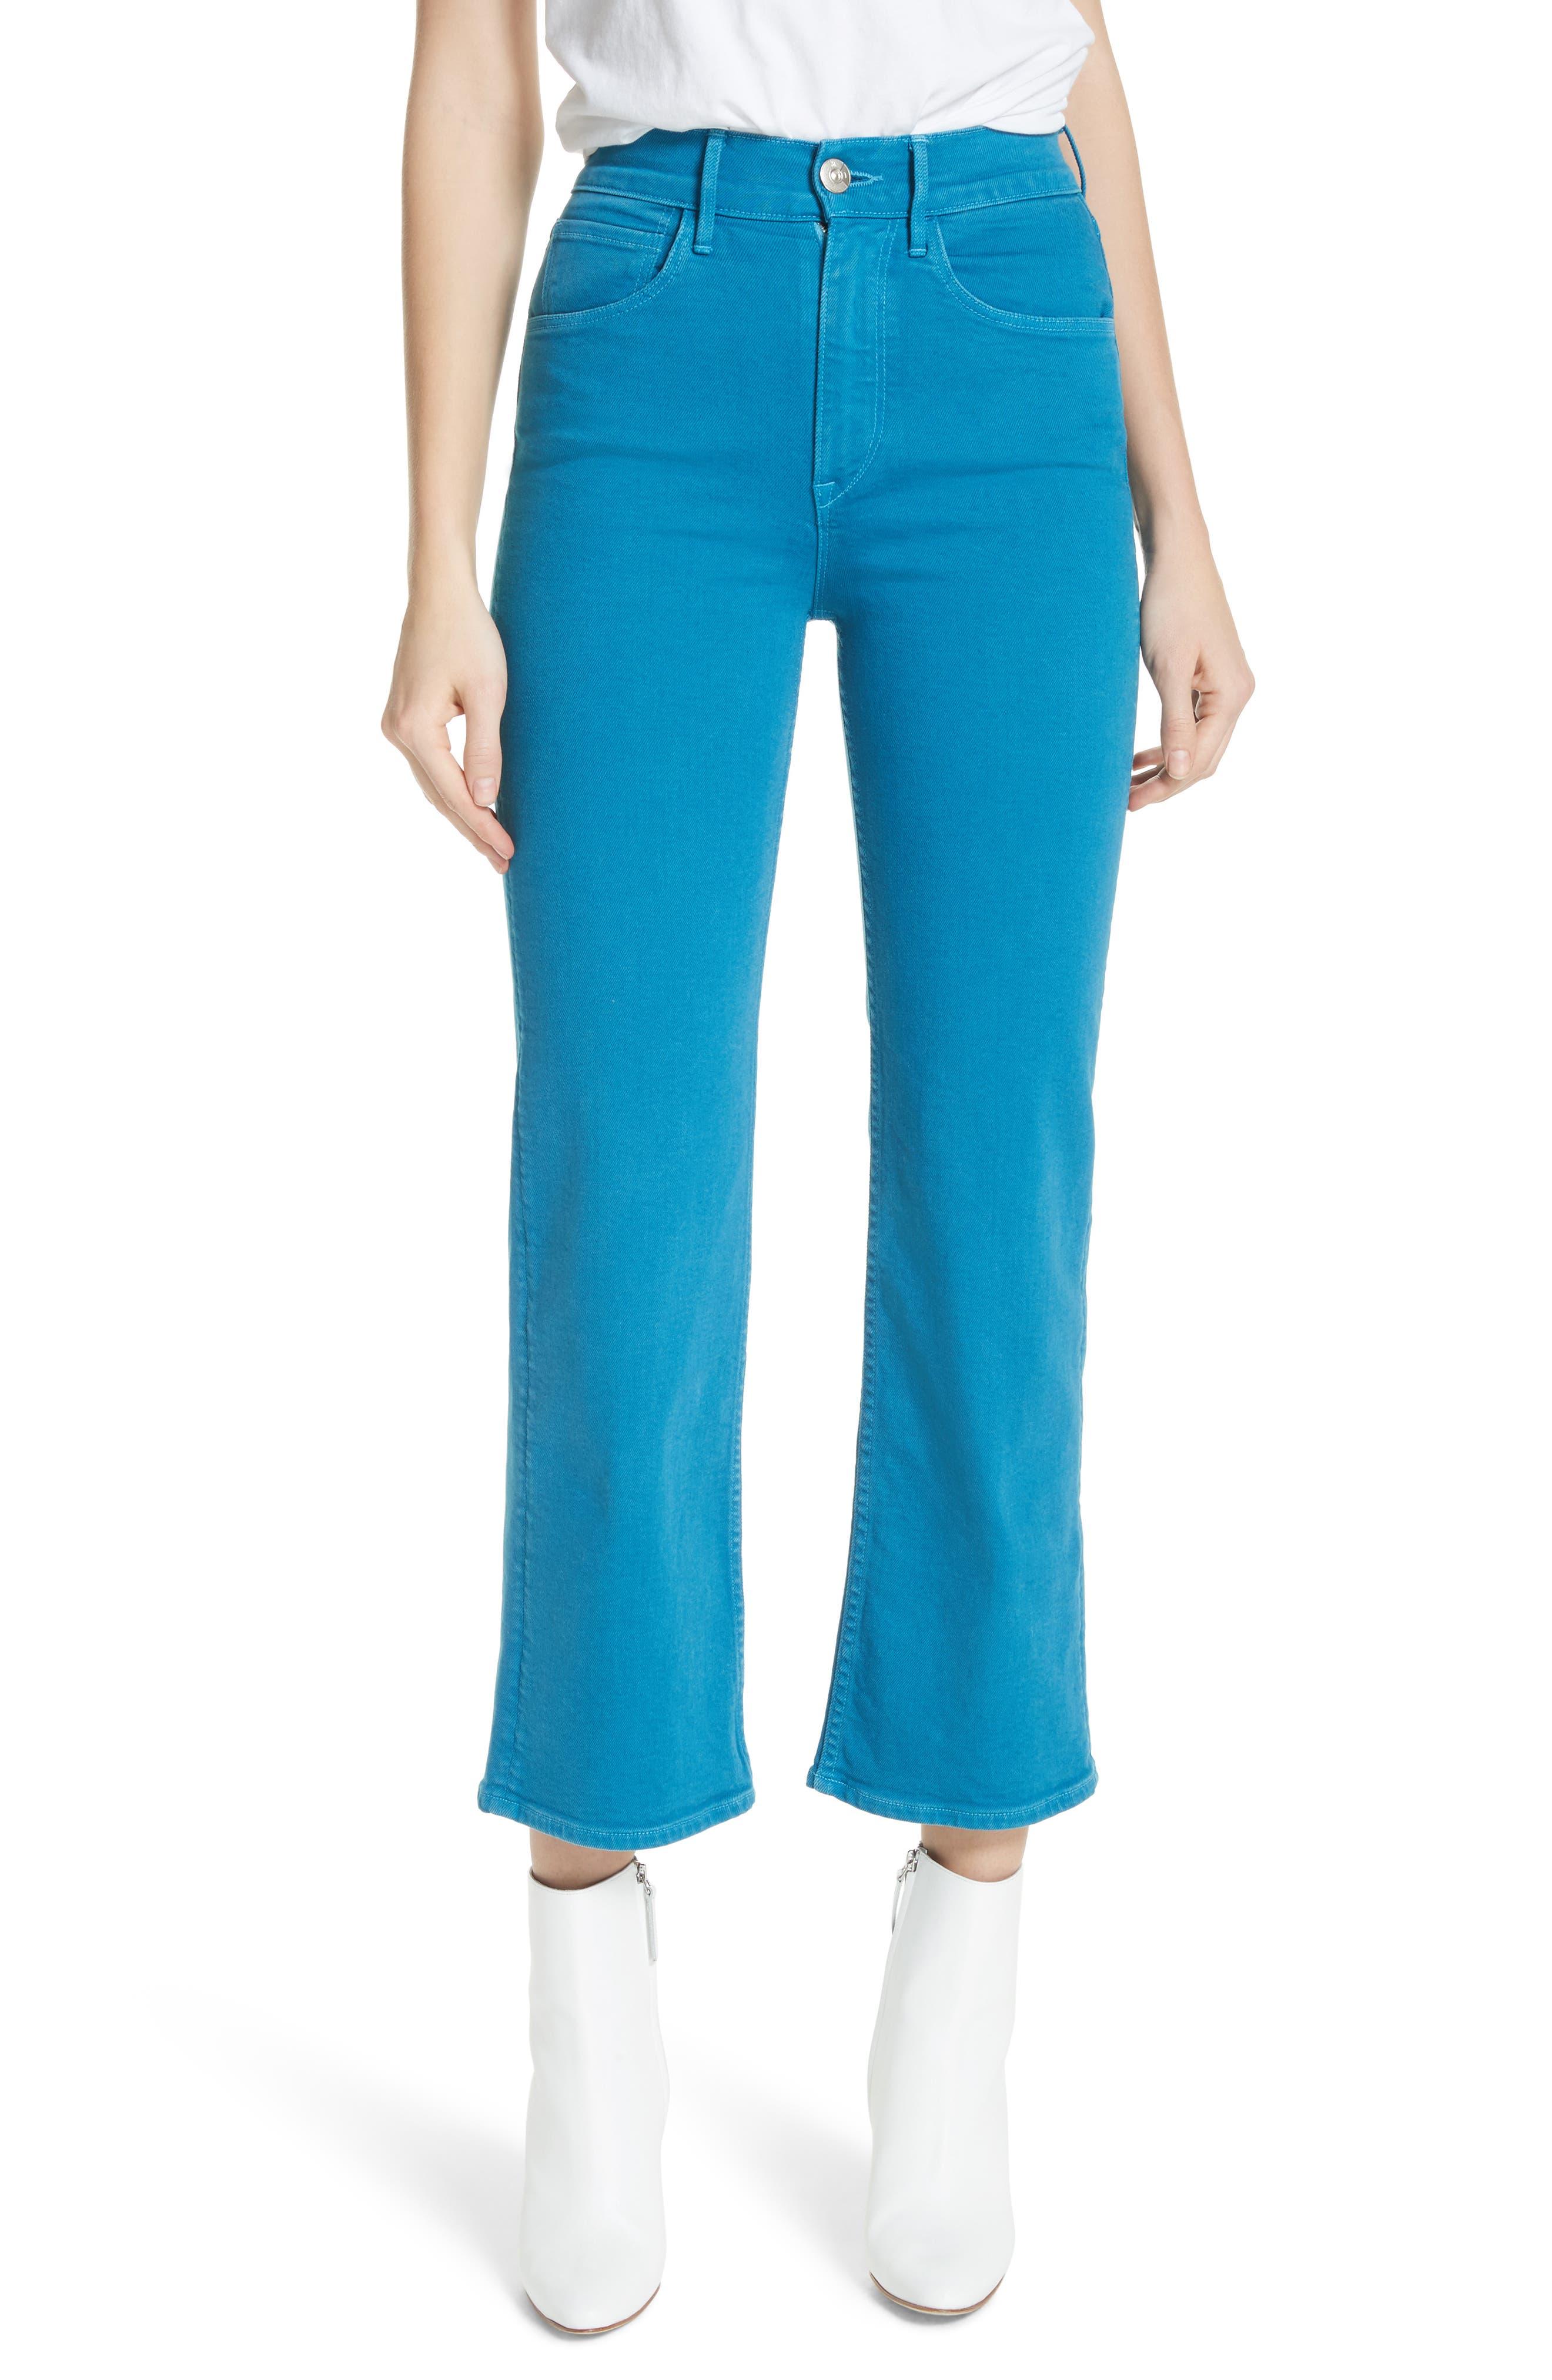 W4 Shelter Wide Leg Crop Jeans,                         Main,                         color, PEACOCK BLUE